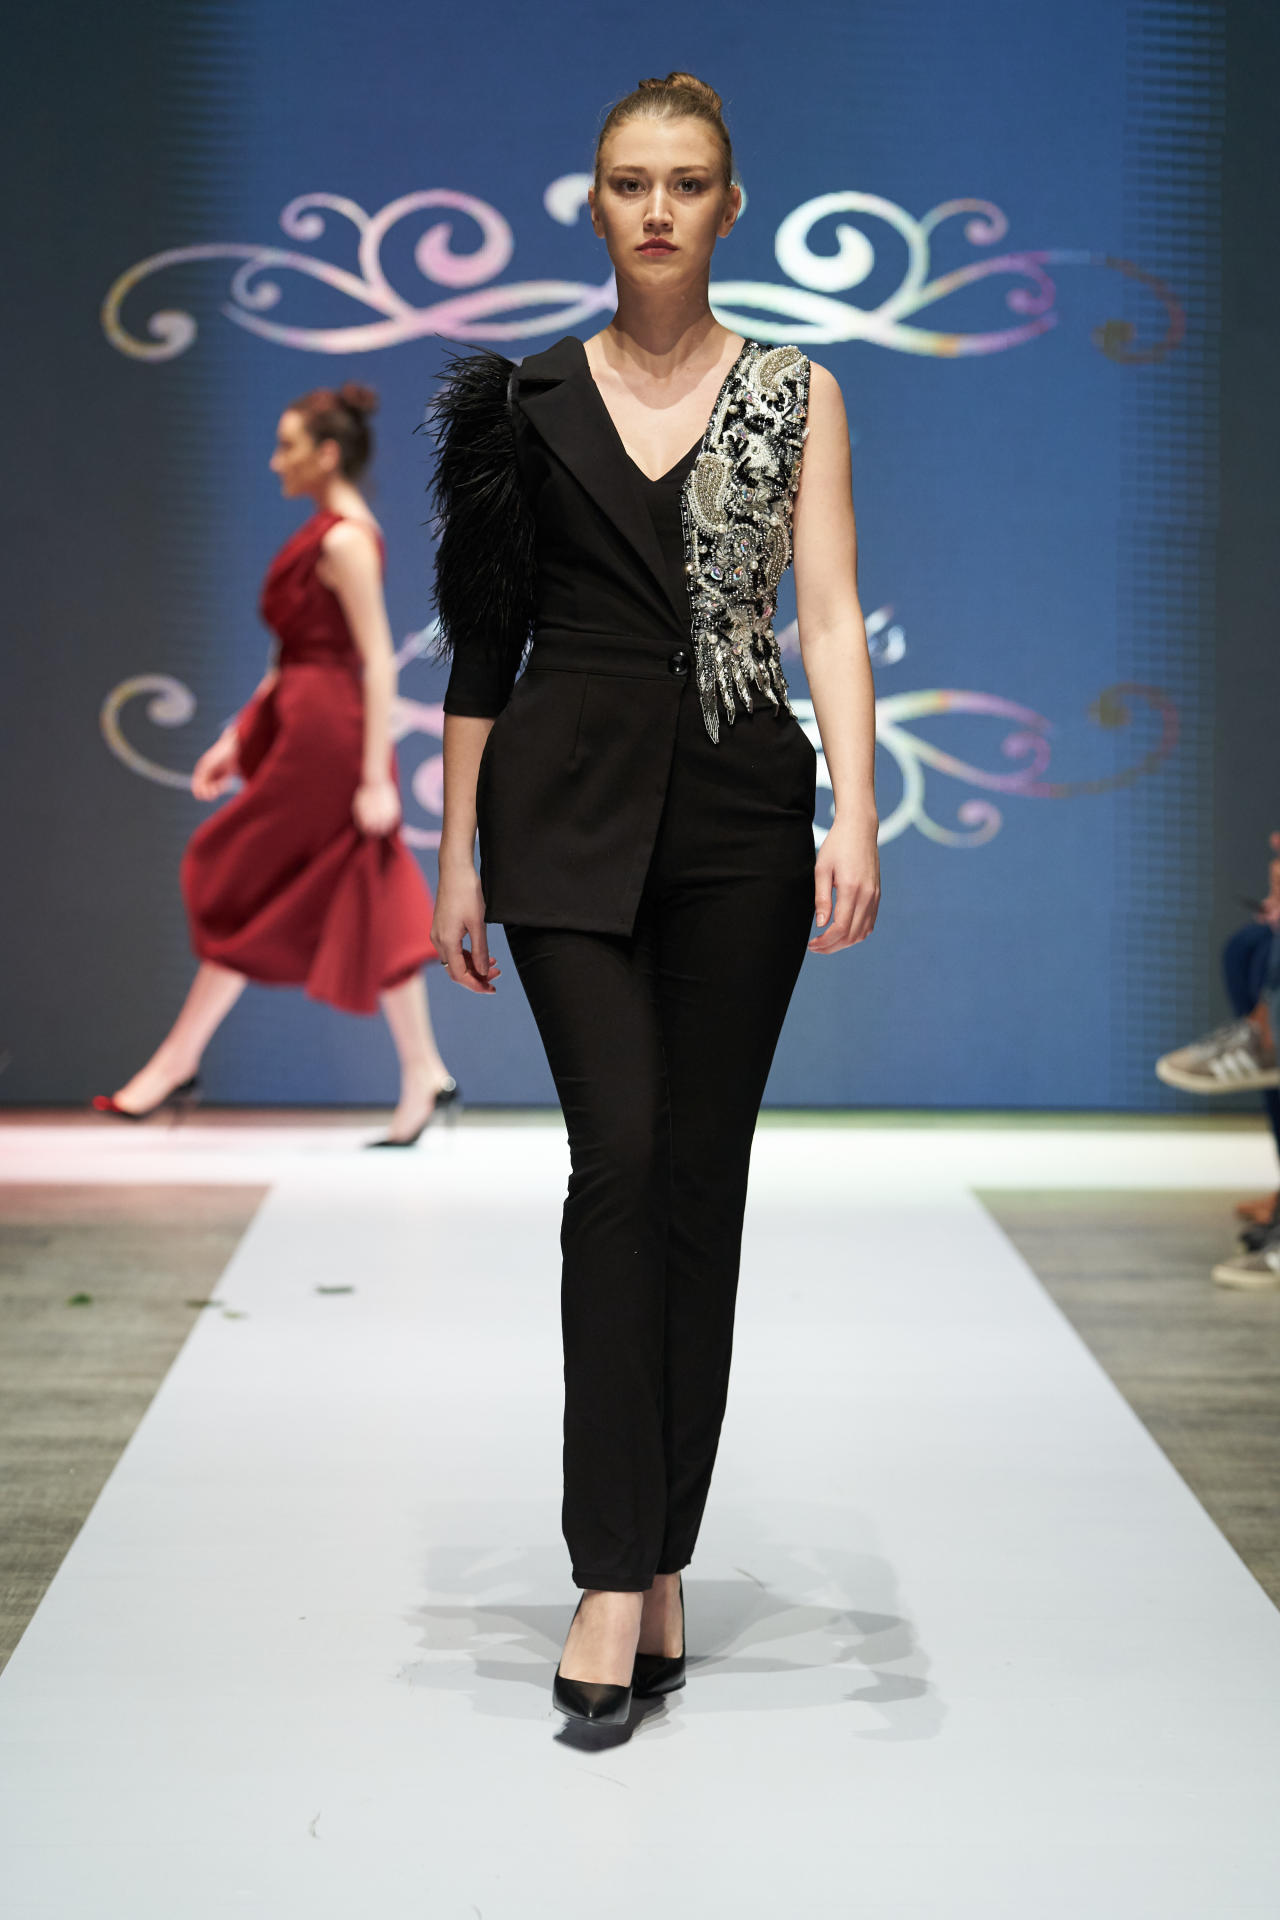 Юбилейный Azerbaijan Fashion Week – нарушение правил, загадки Африки, гламур Востока и Запада (ФОТО) - Gallery Image